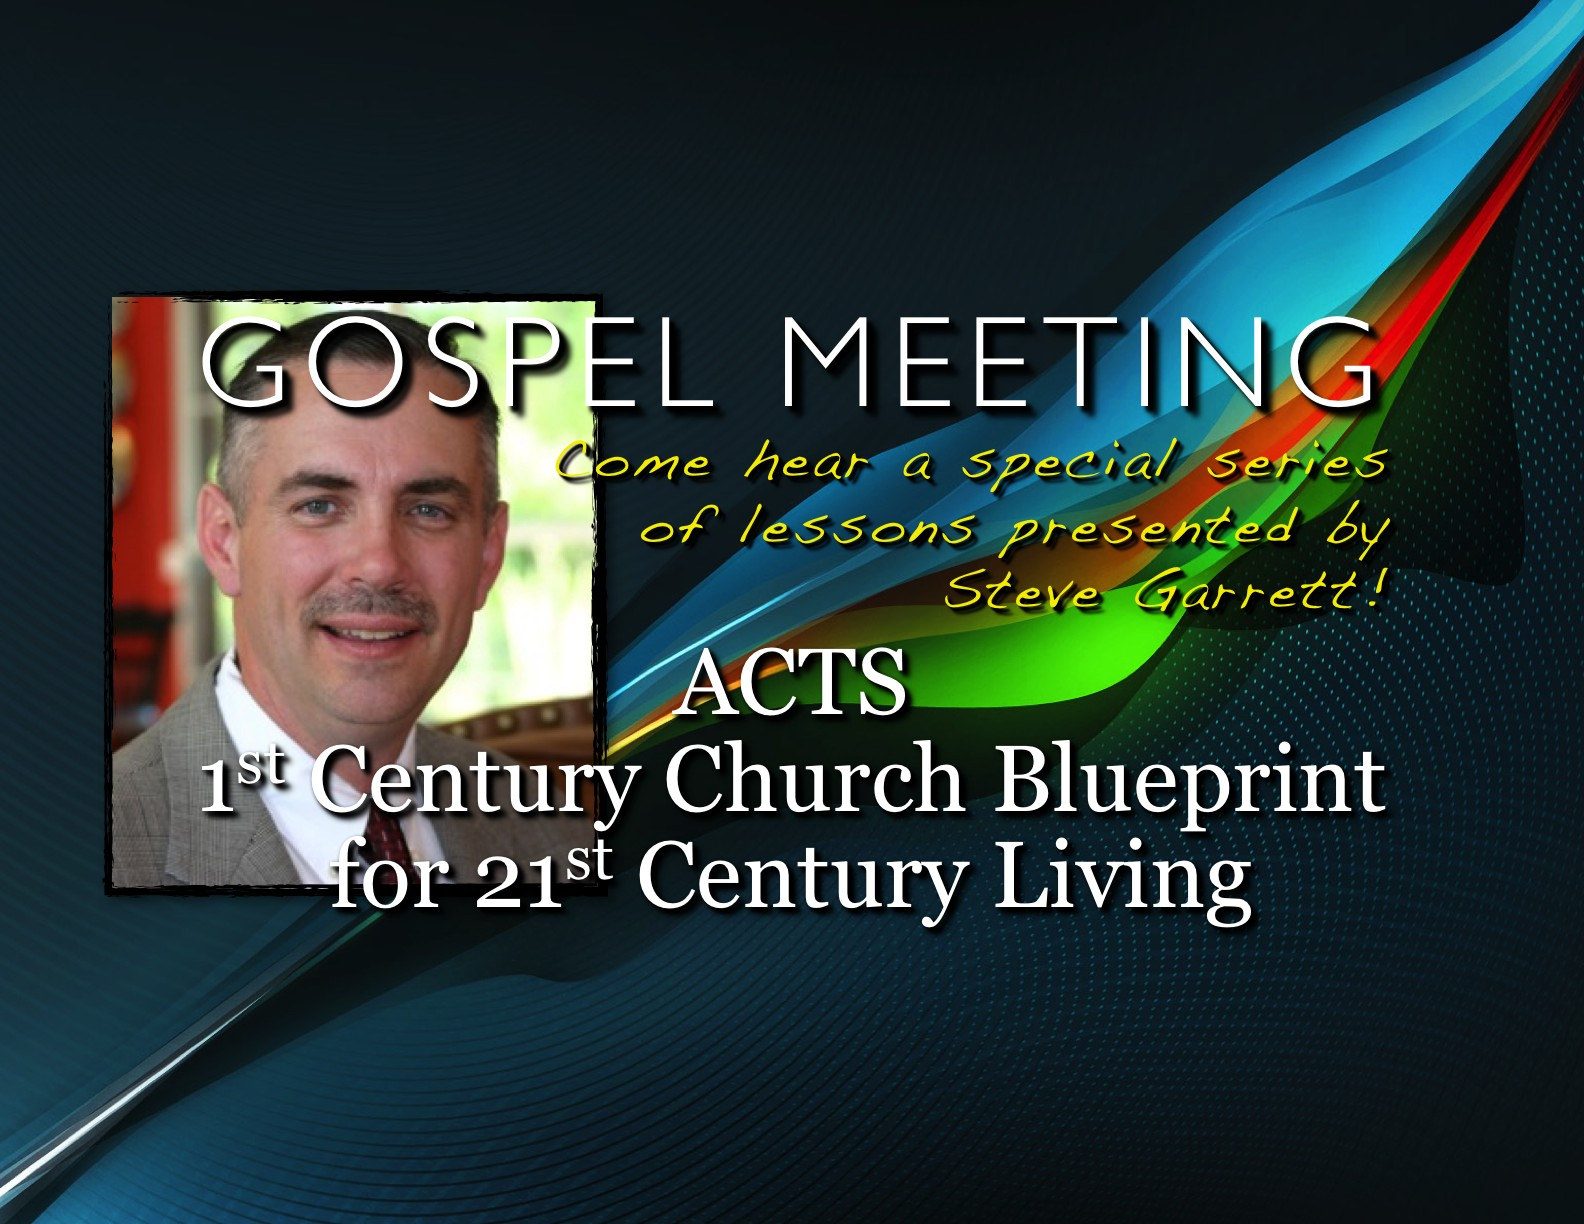 Spring 2013 Meeting With Steve Garrett